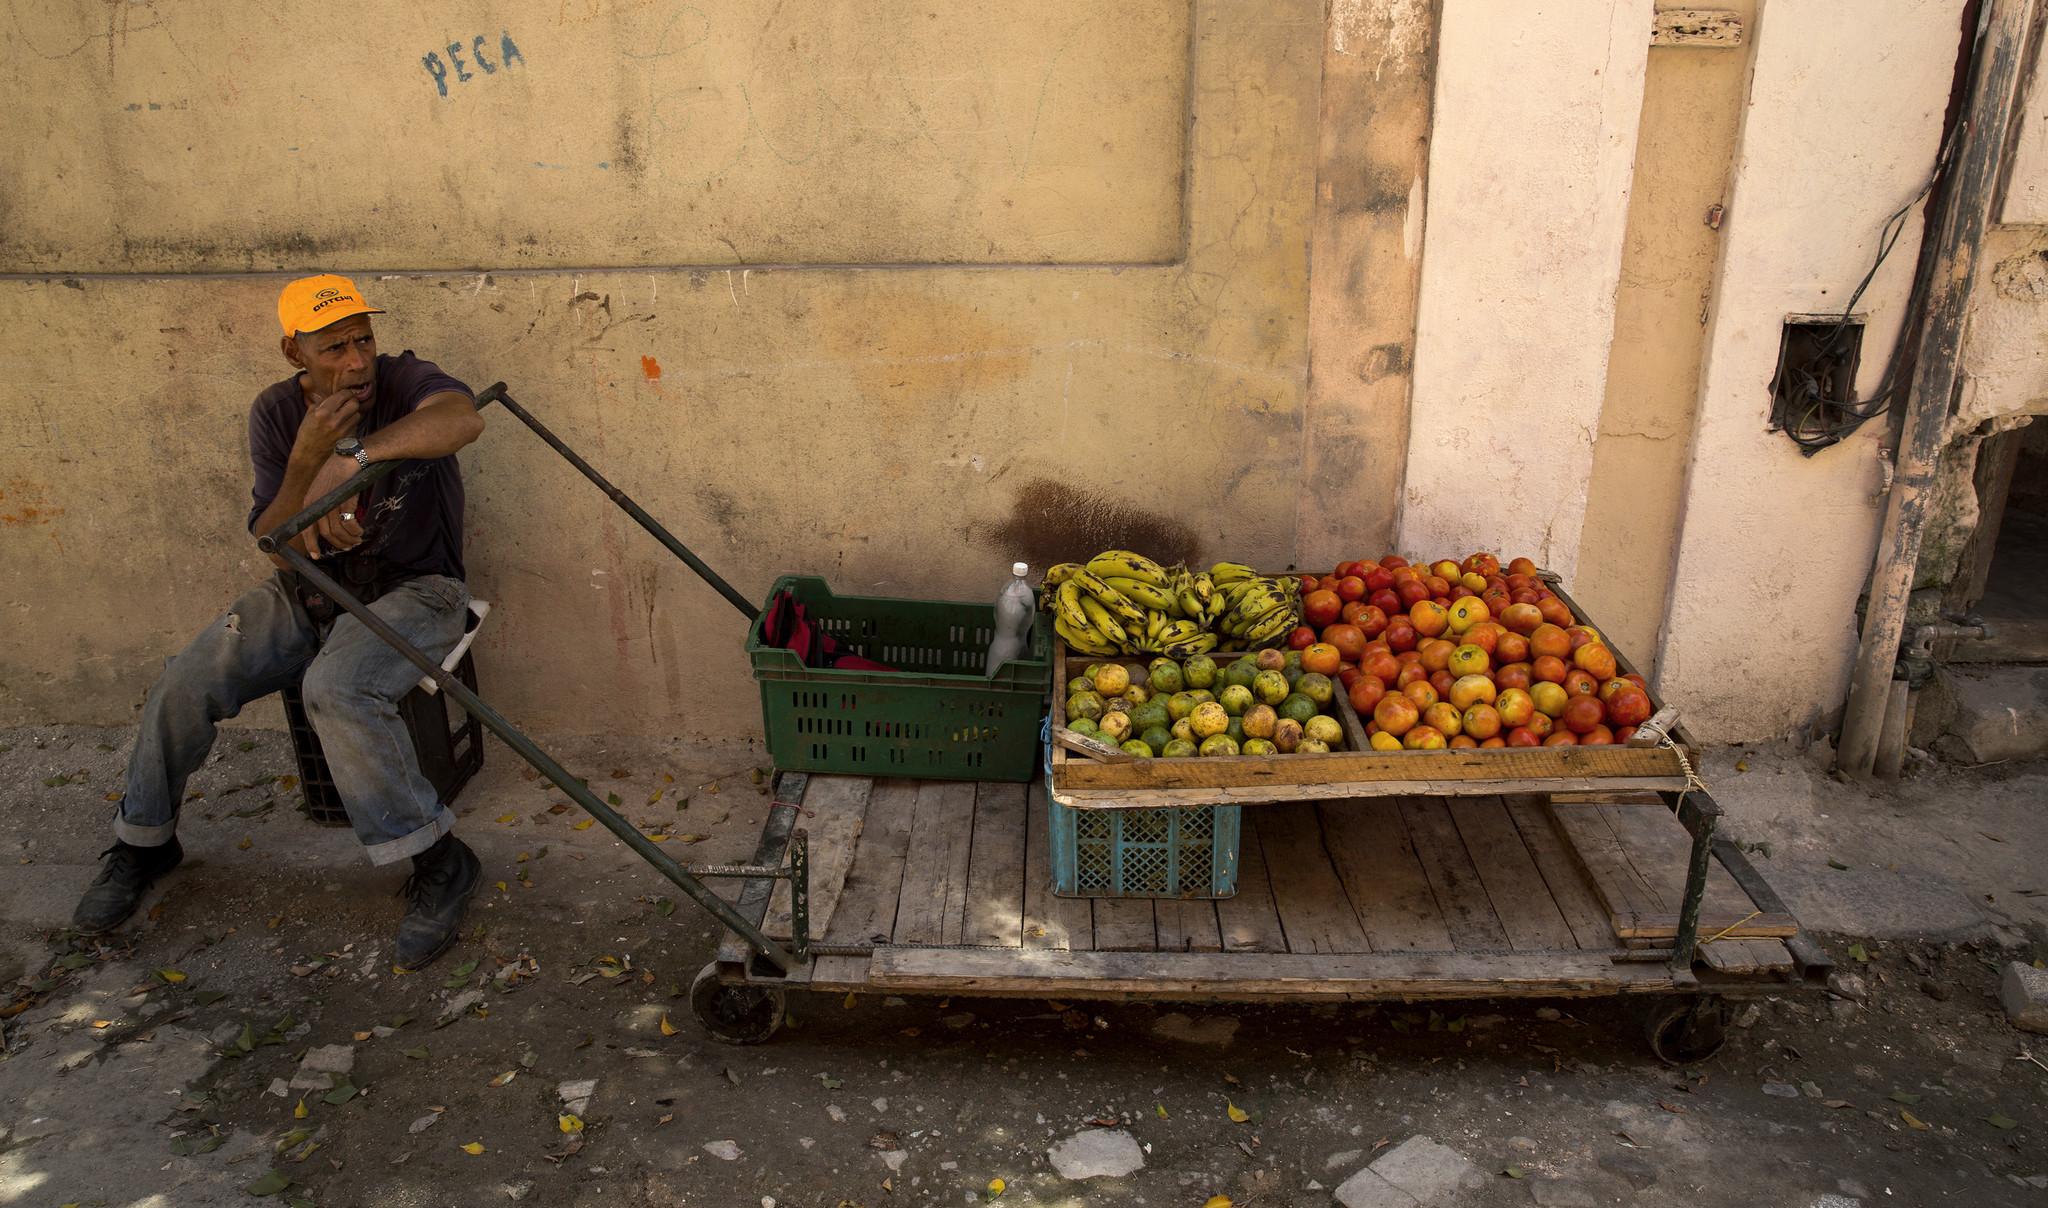 produce vendor and cart